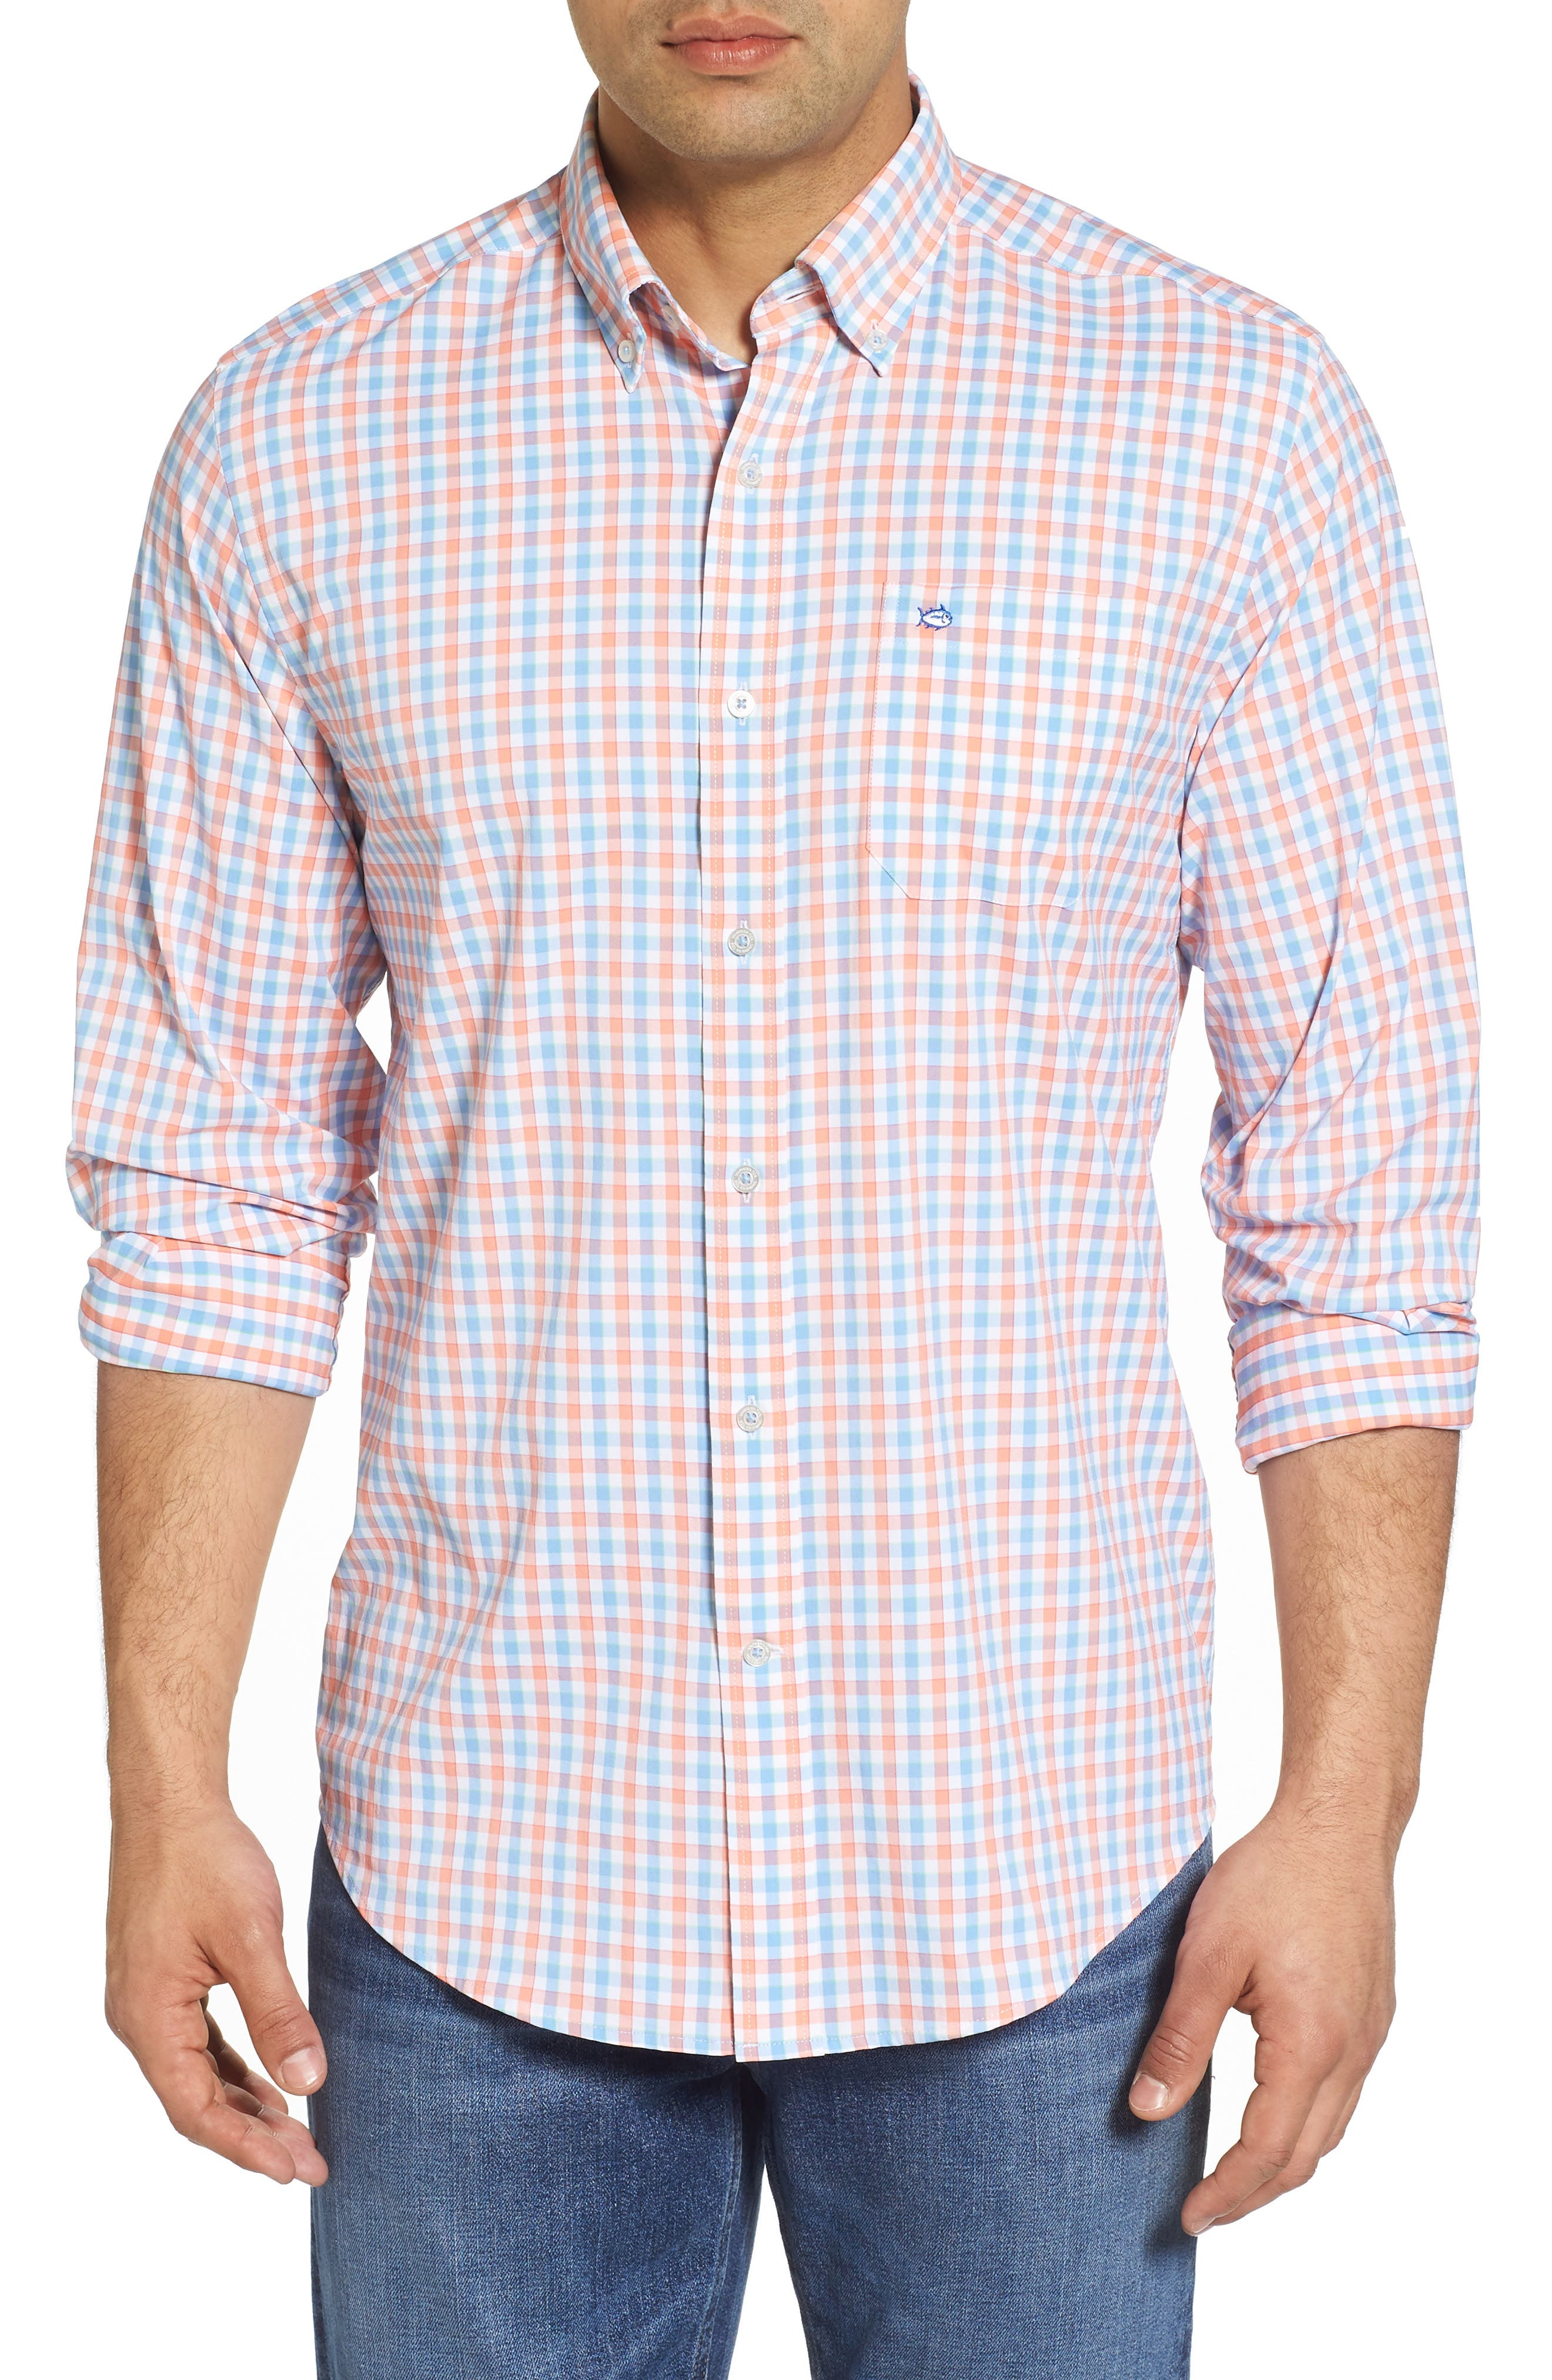 Market Square Regular Fit Stretch Check Sport Shirt,                         Main,                         color, 801